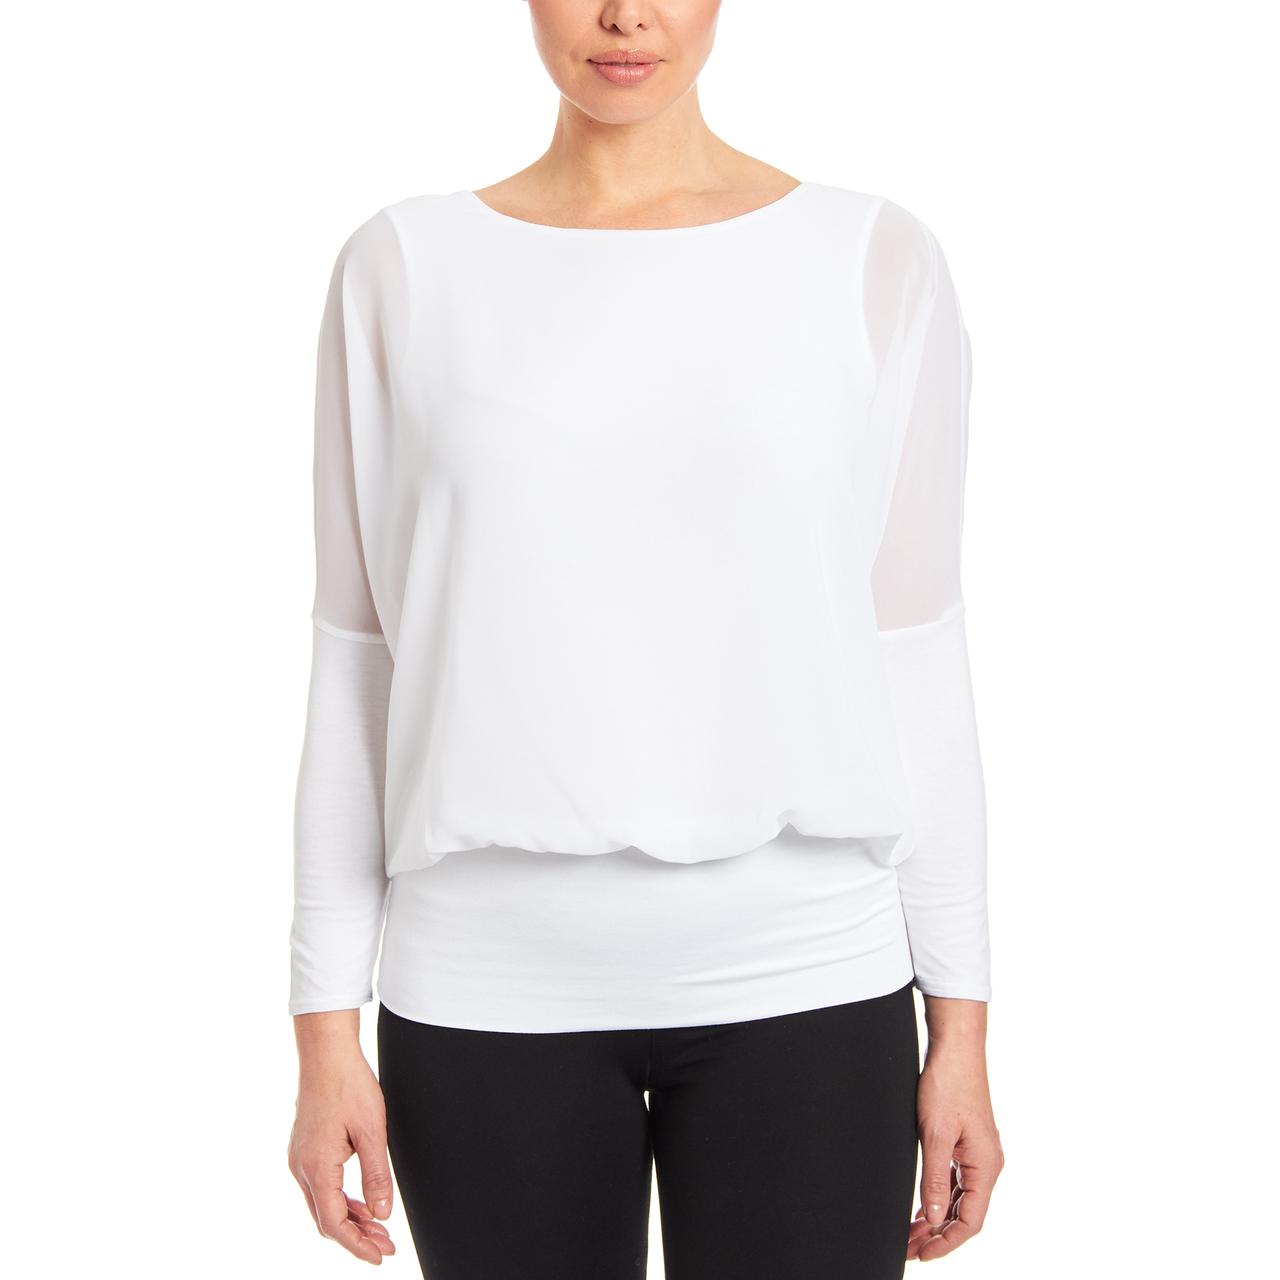 Dolman Long Sleeve Blouse in White